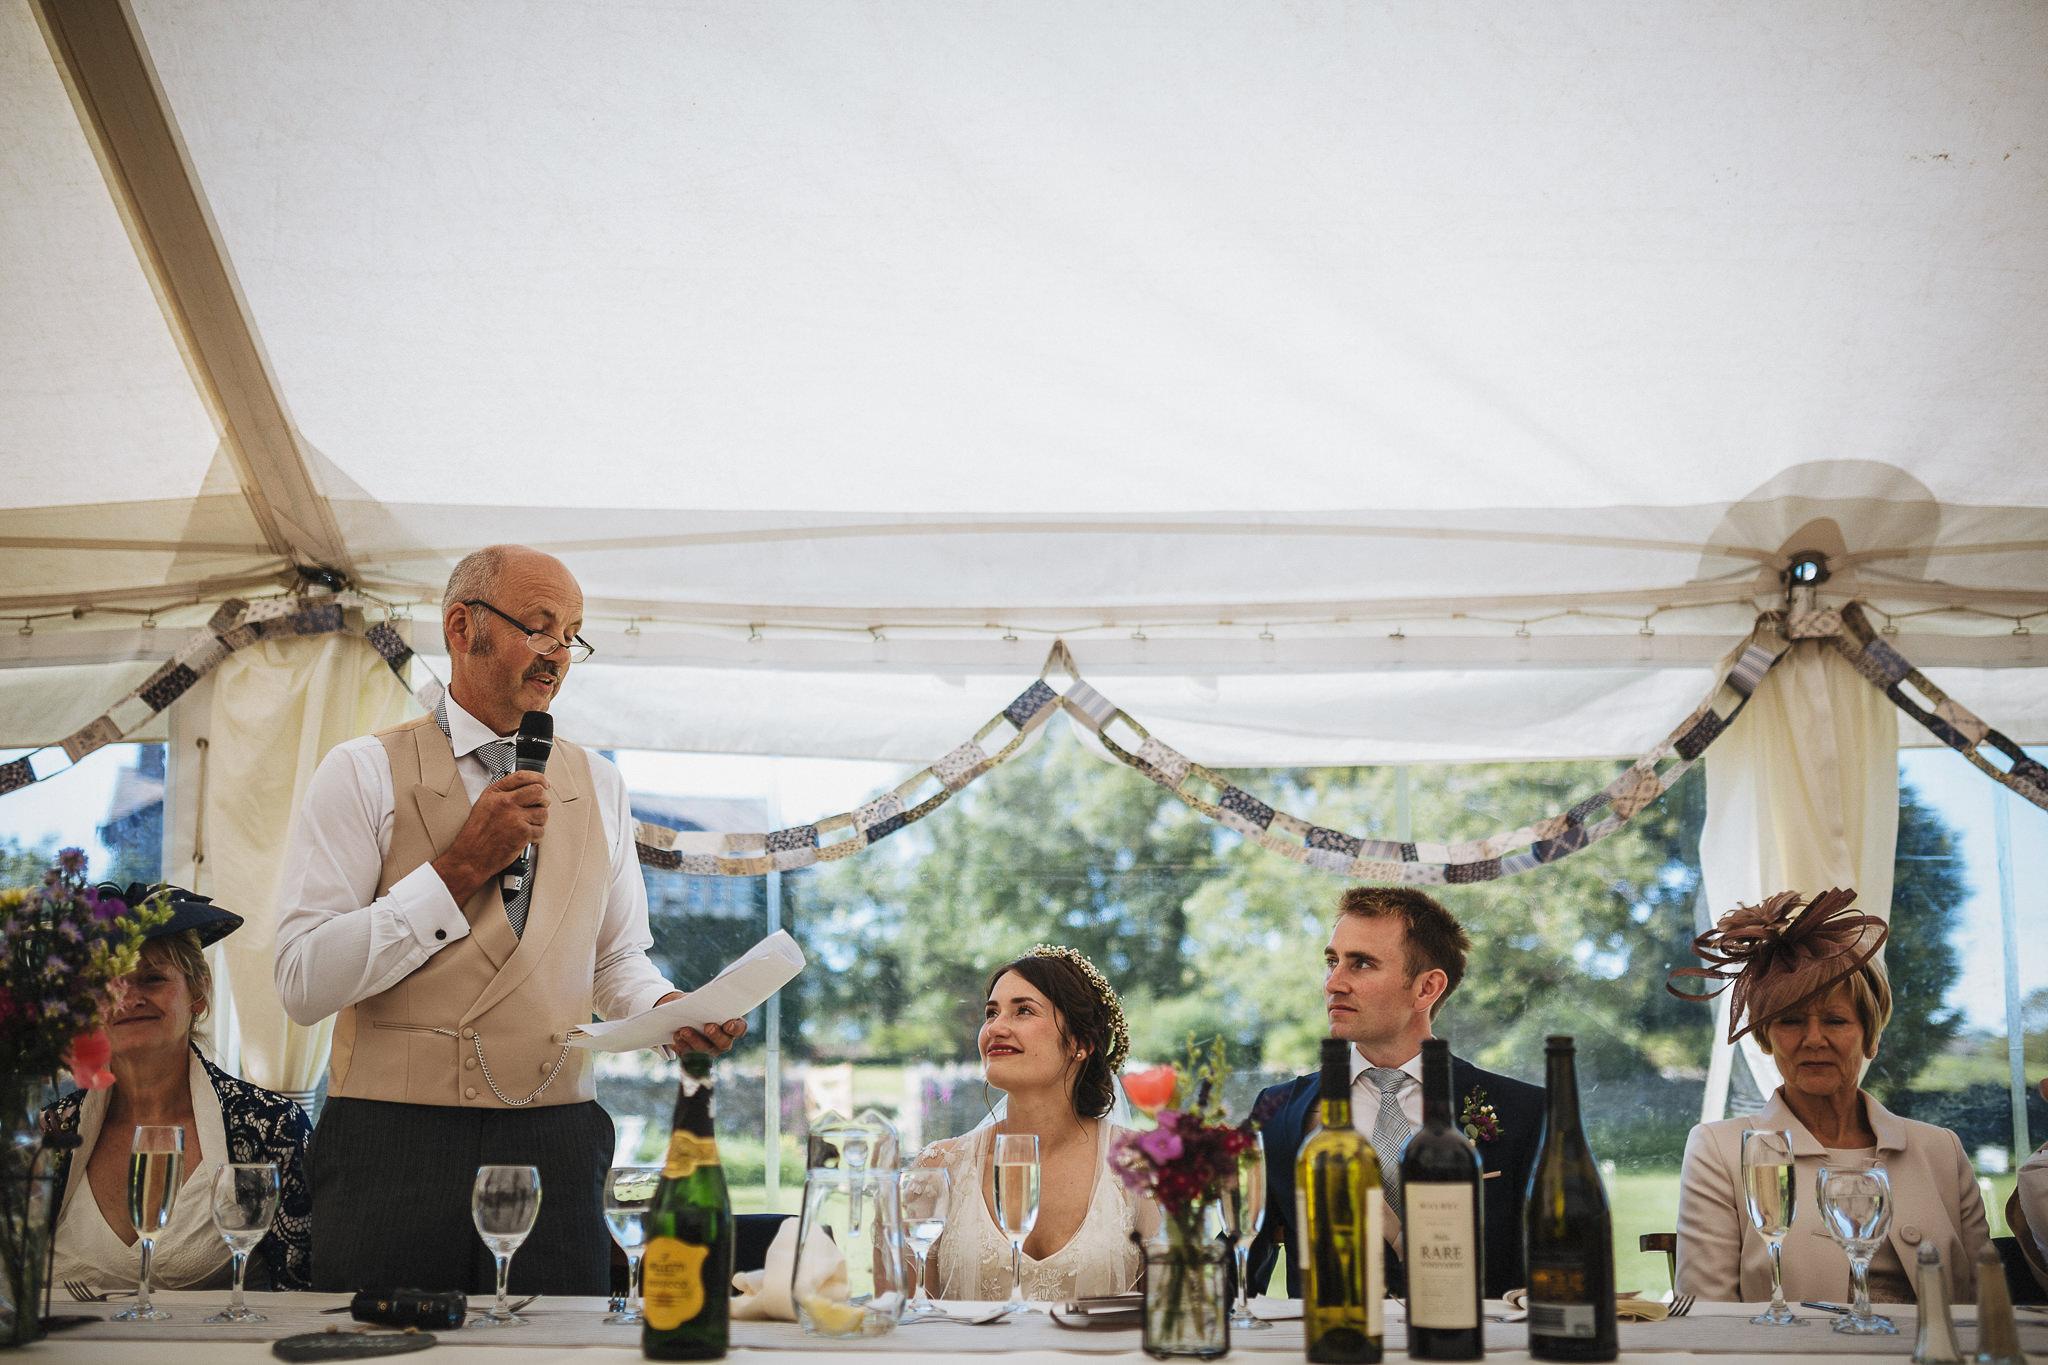 paul-marbrook-Farm-Wedding-Photographer-Lancashire-90054